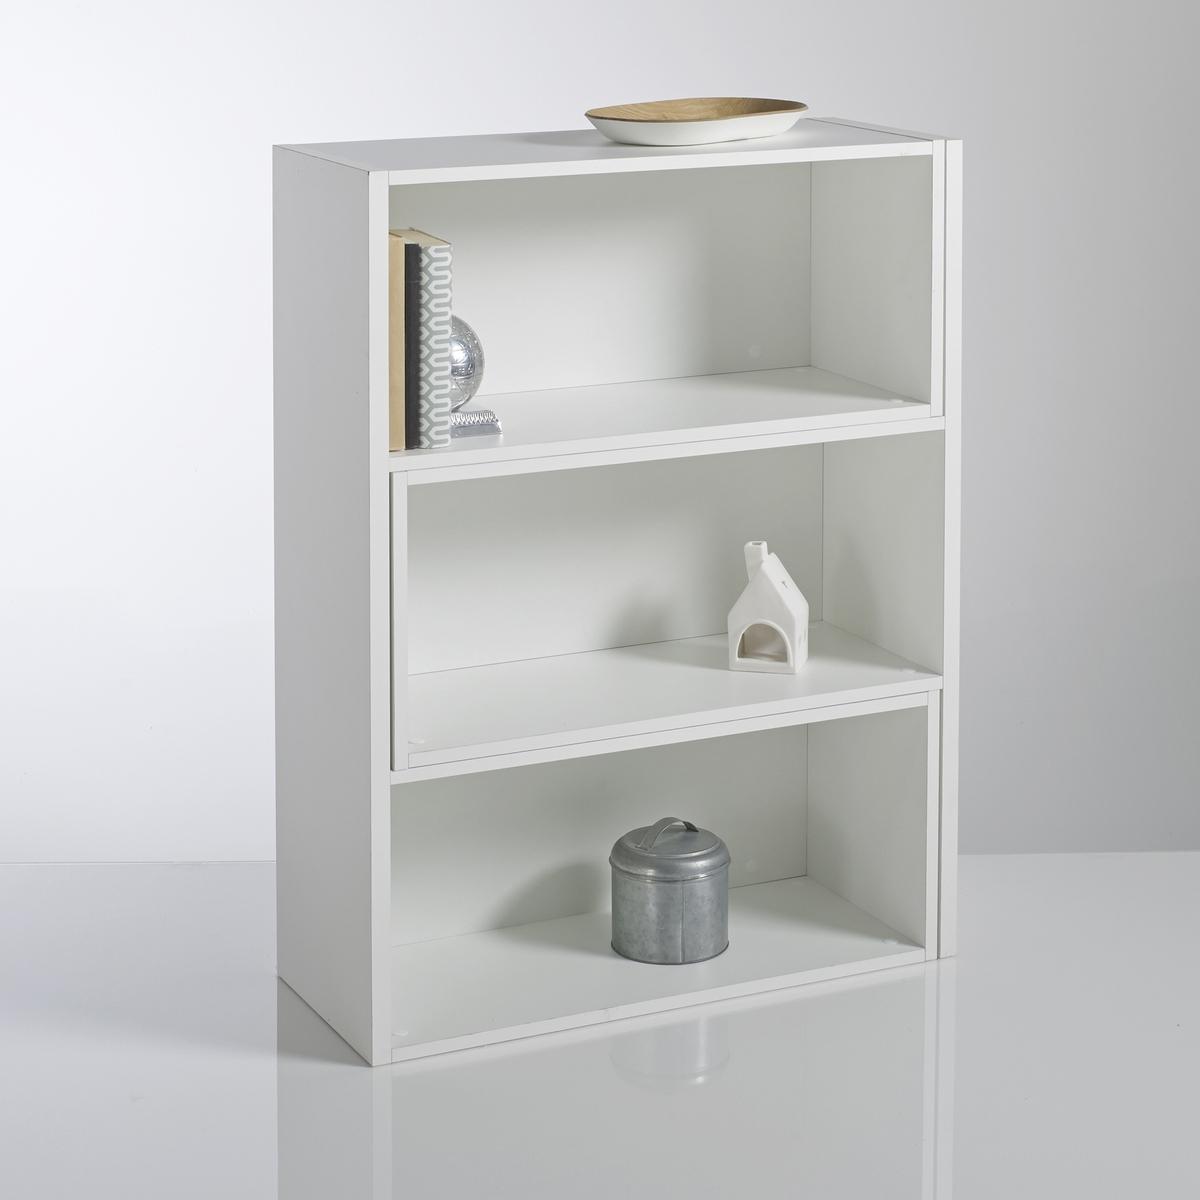 Шкаф LaRedoute Книжный высота 1 метр Everett единый размер белый